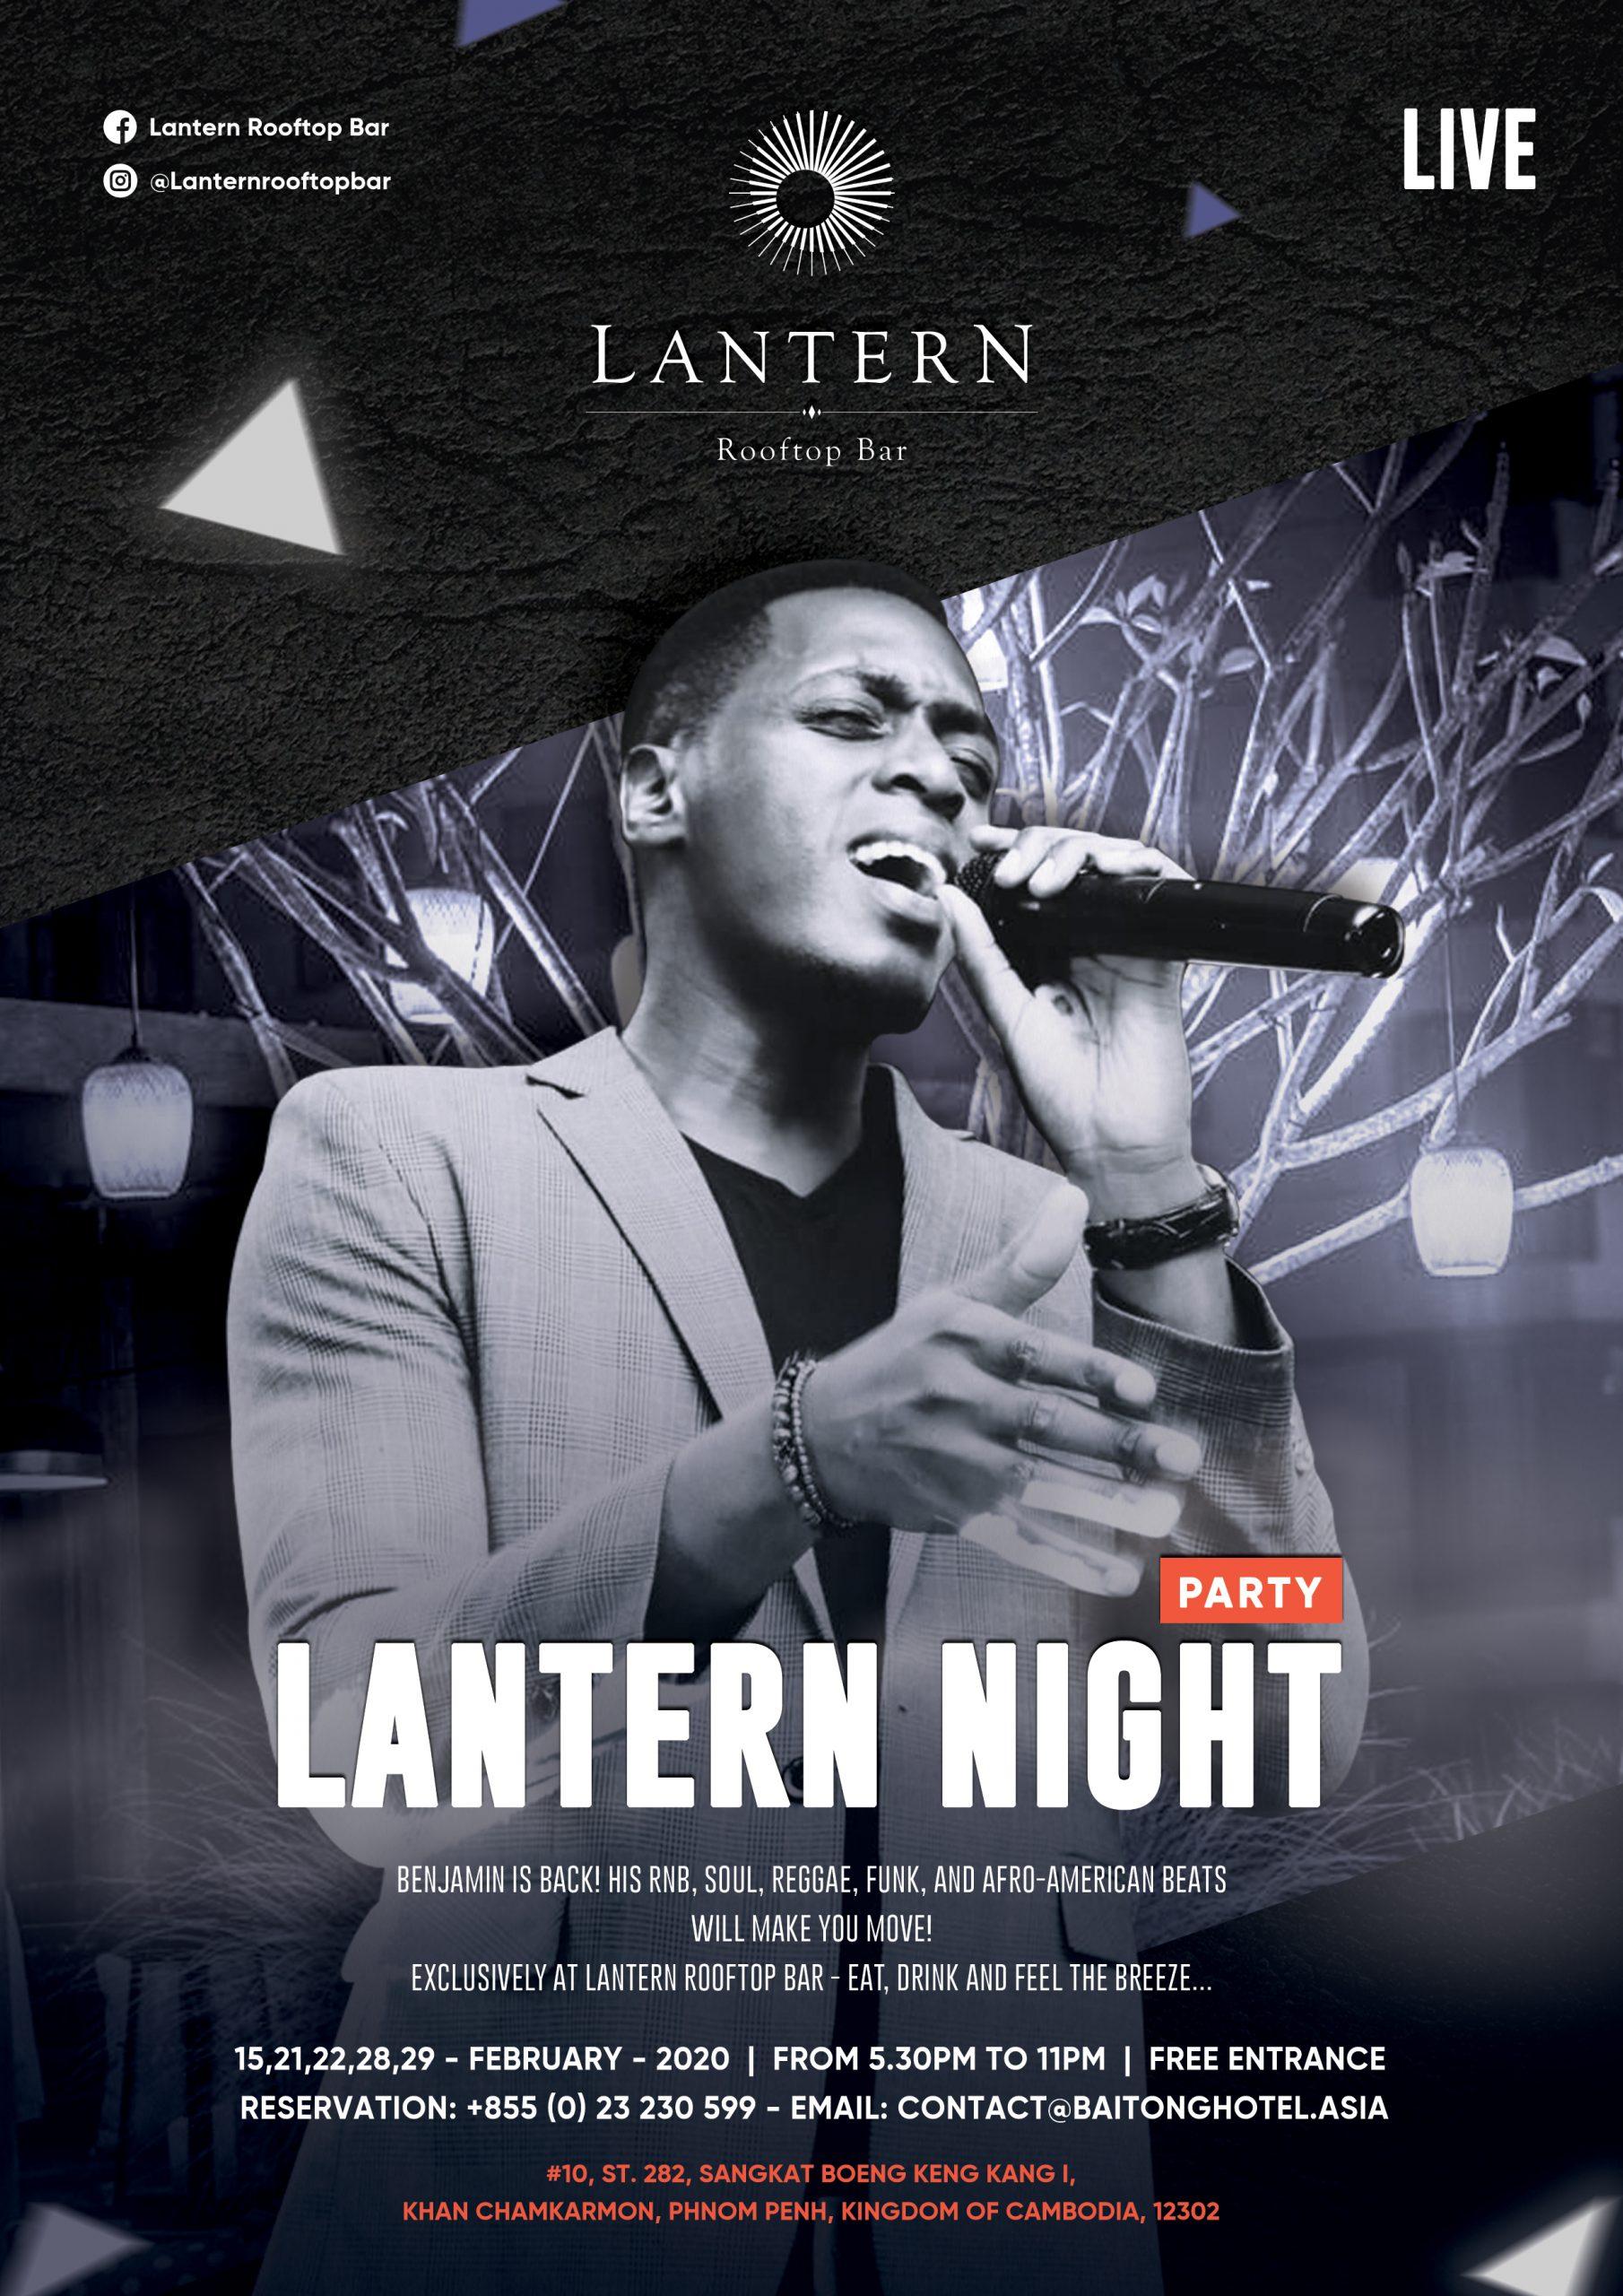 LANTERN NIGHT – BENJAMIN